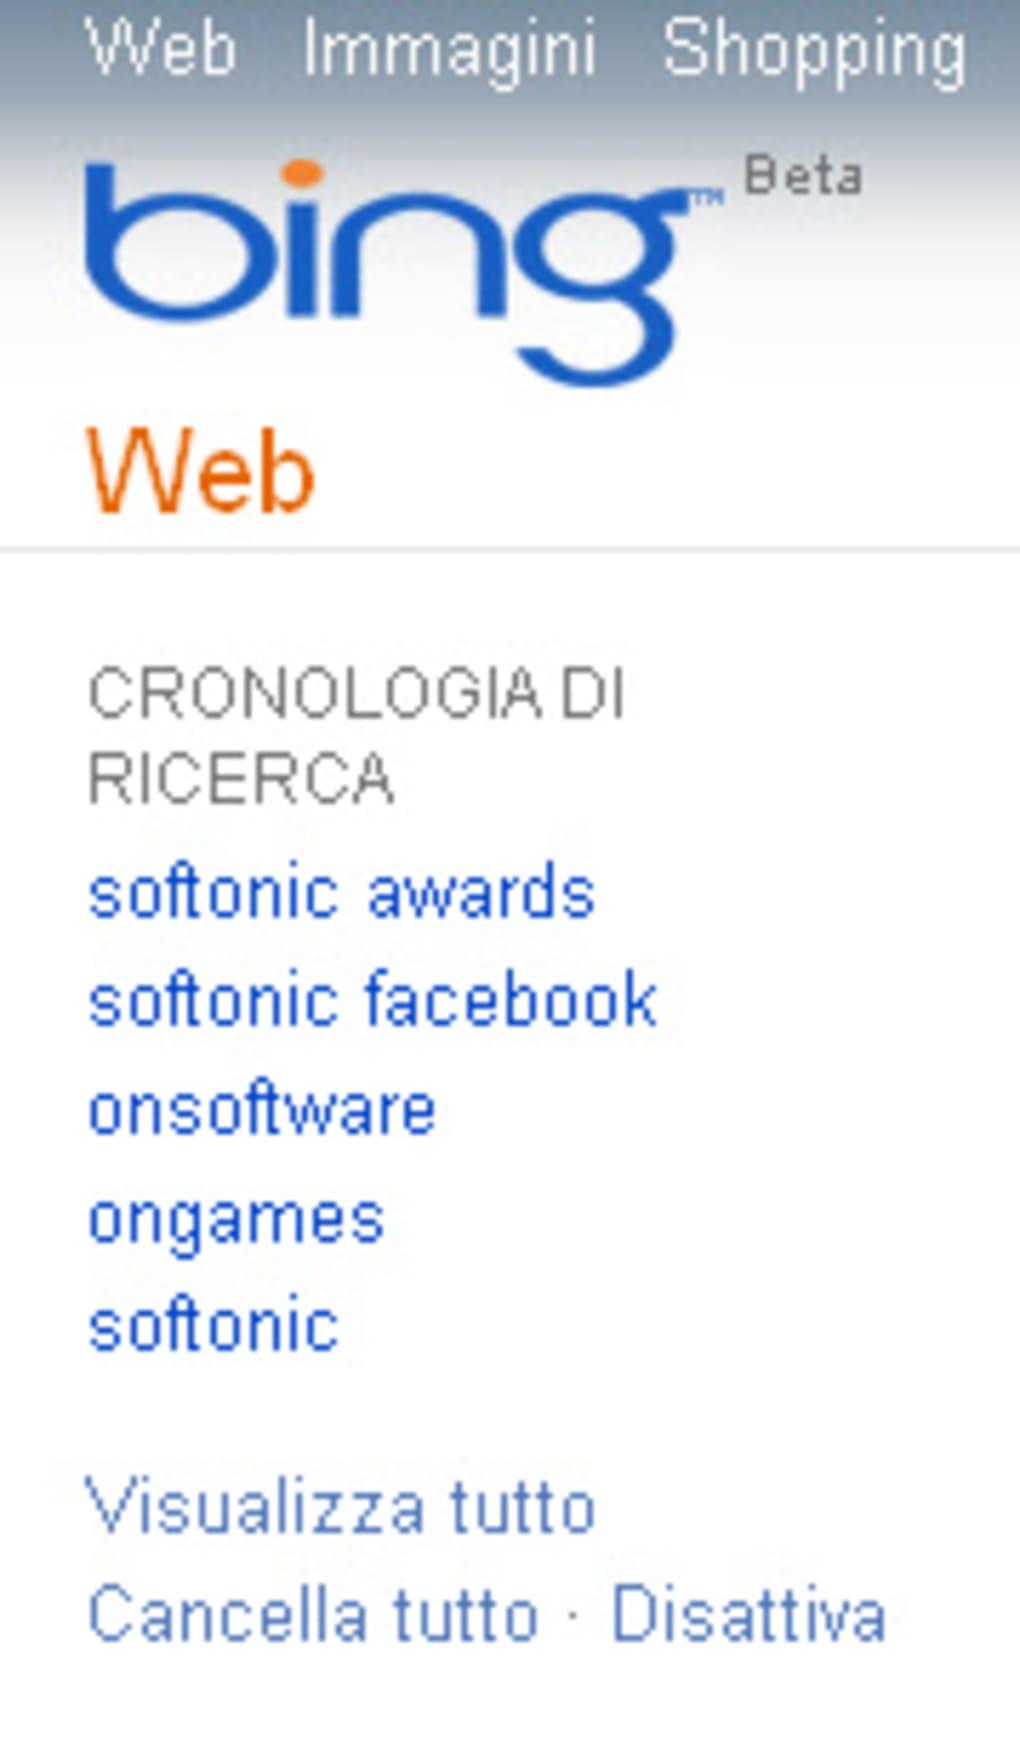 Www Bing Comgo To Www Bing Commail At Abc Microsoft Com1 Microsoft Way Redmond Wa: Bing Online